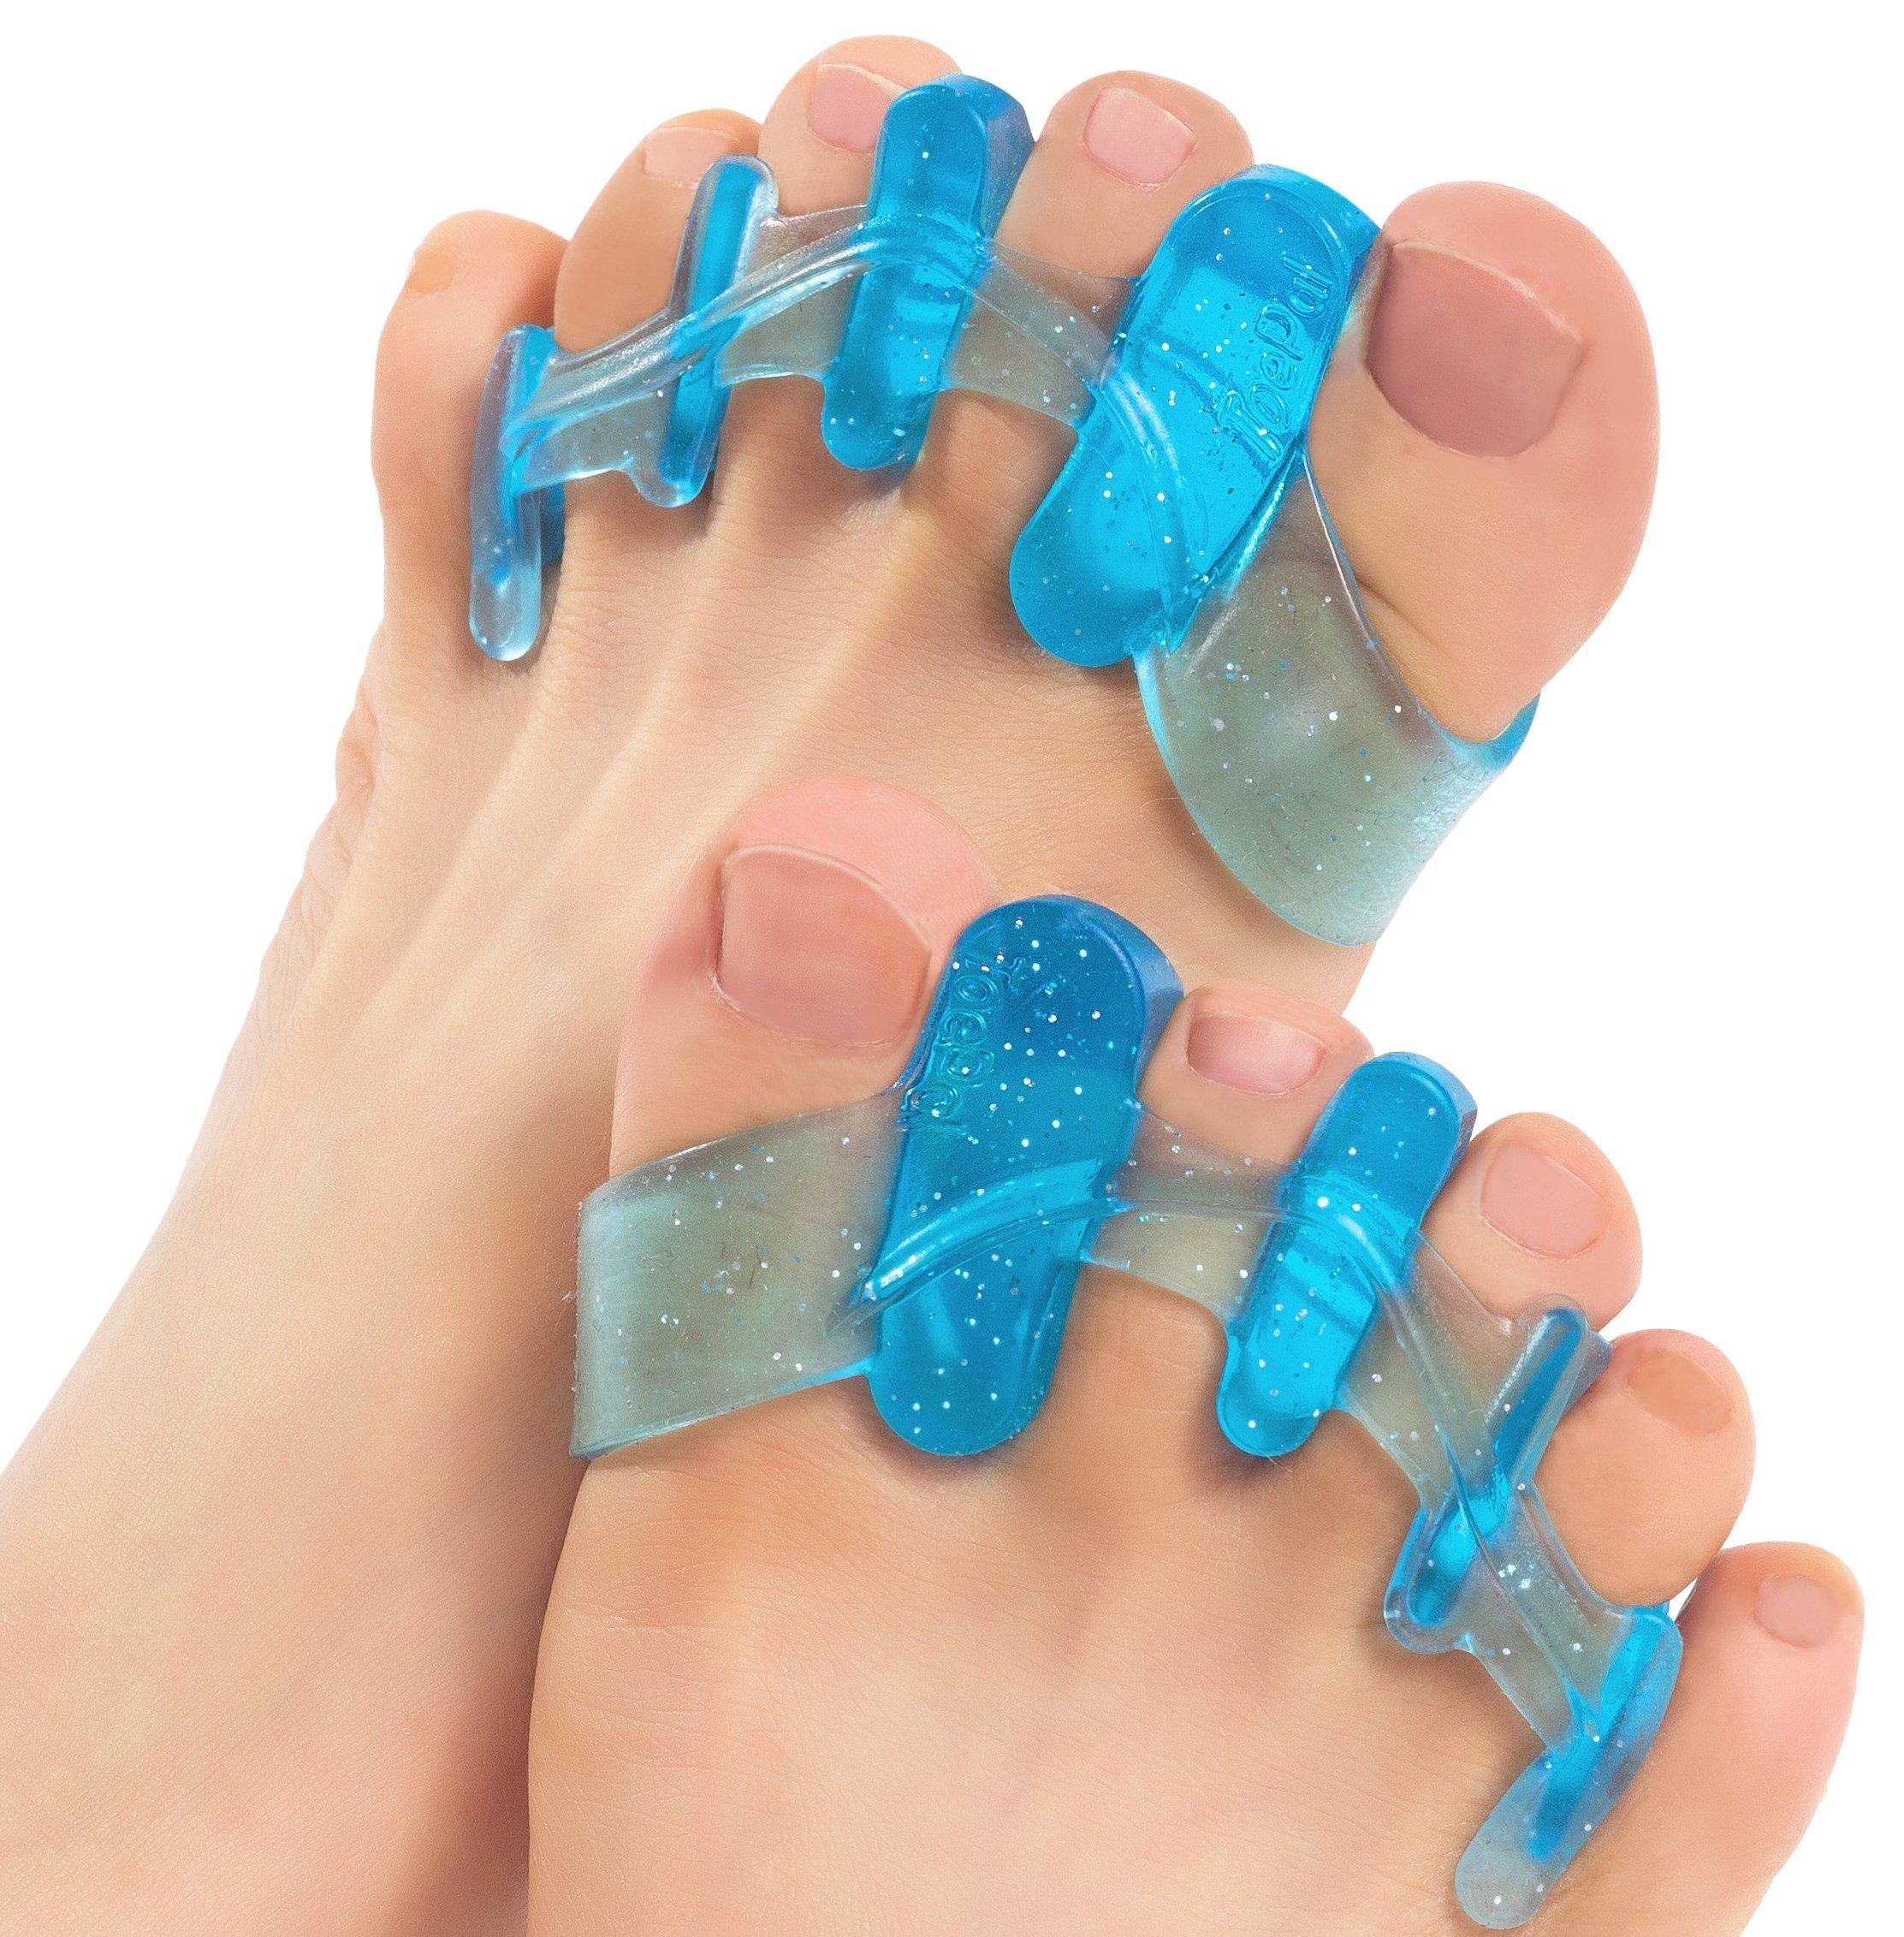 Amazon.com : DR JK Toe Separators, Toe Stretchers for Yoga, Hammer ...